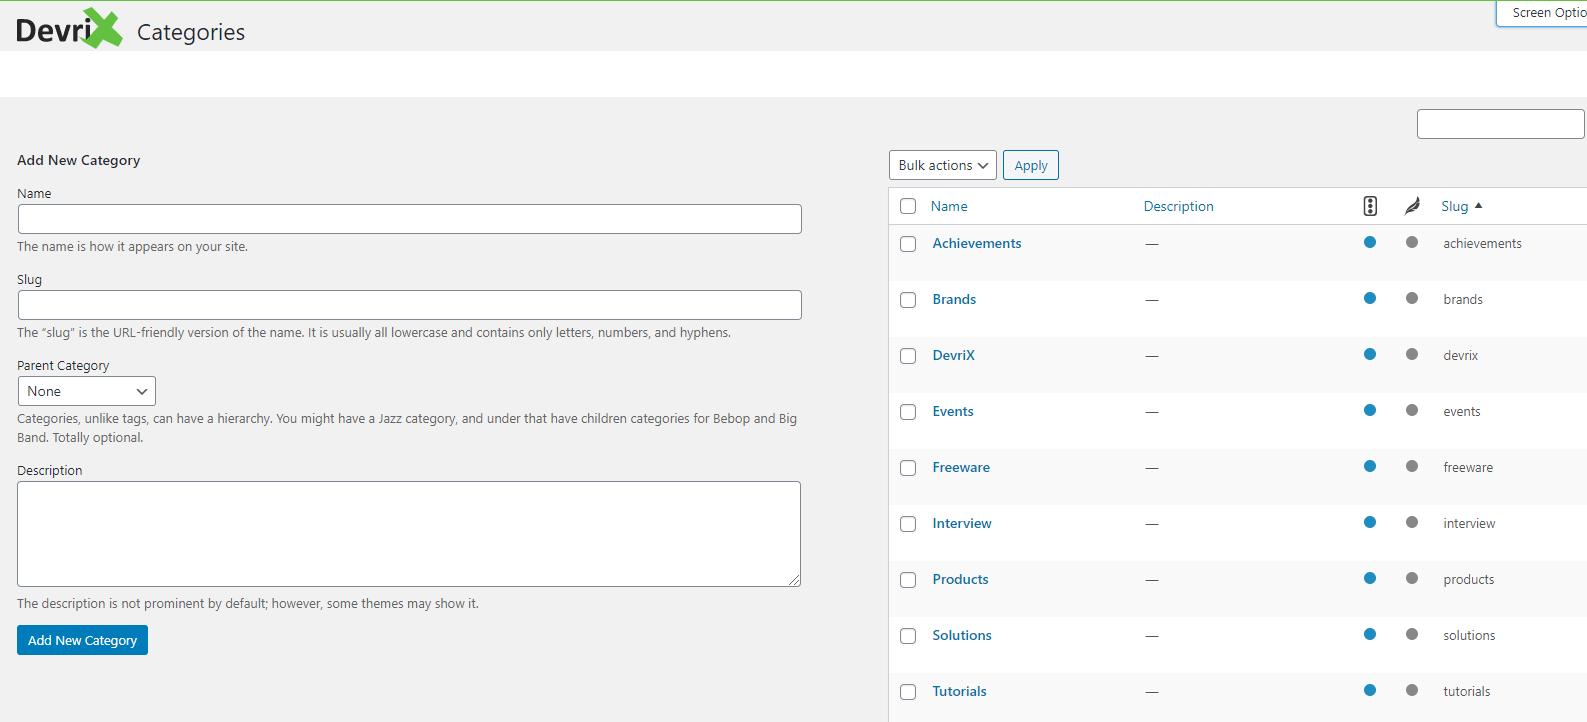 Post Categories on DevriX site